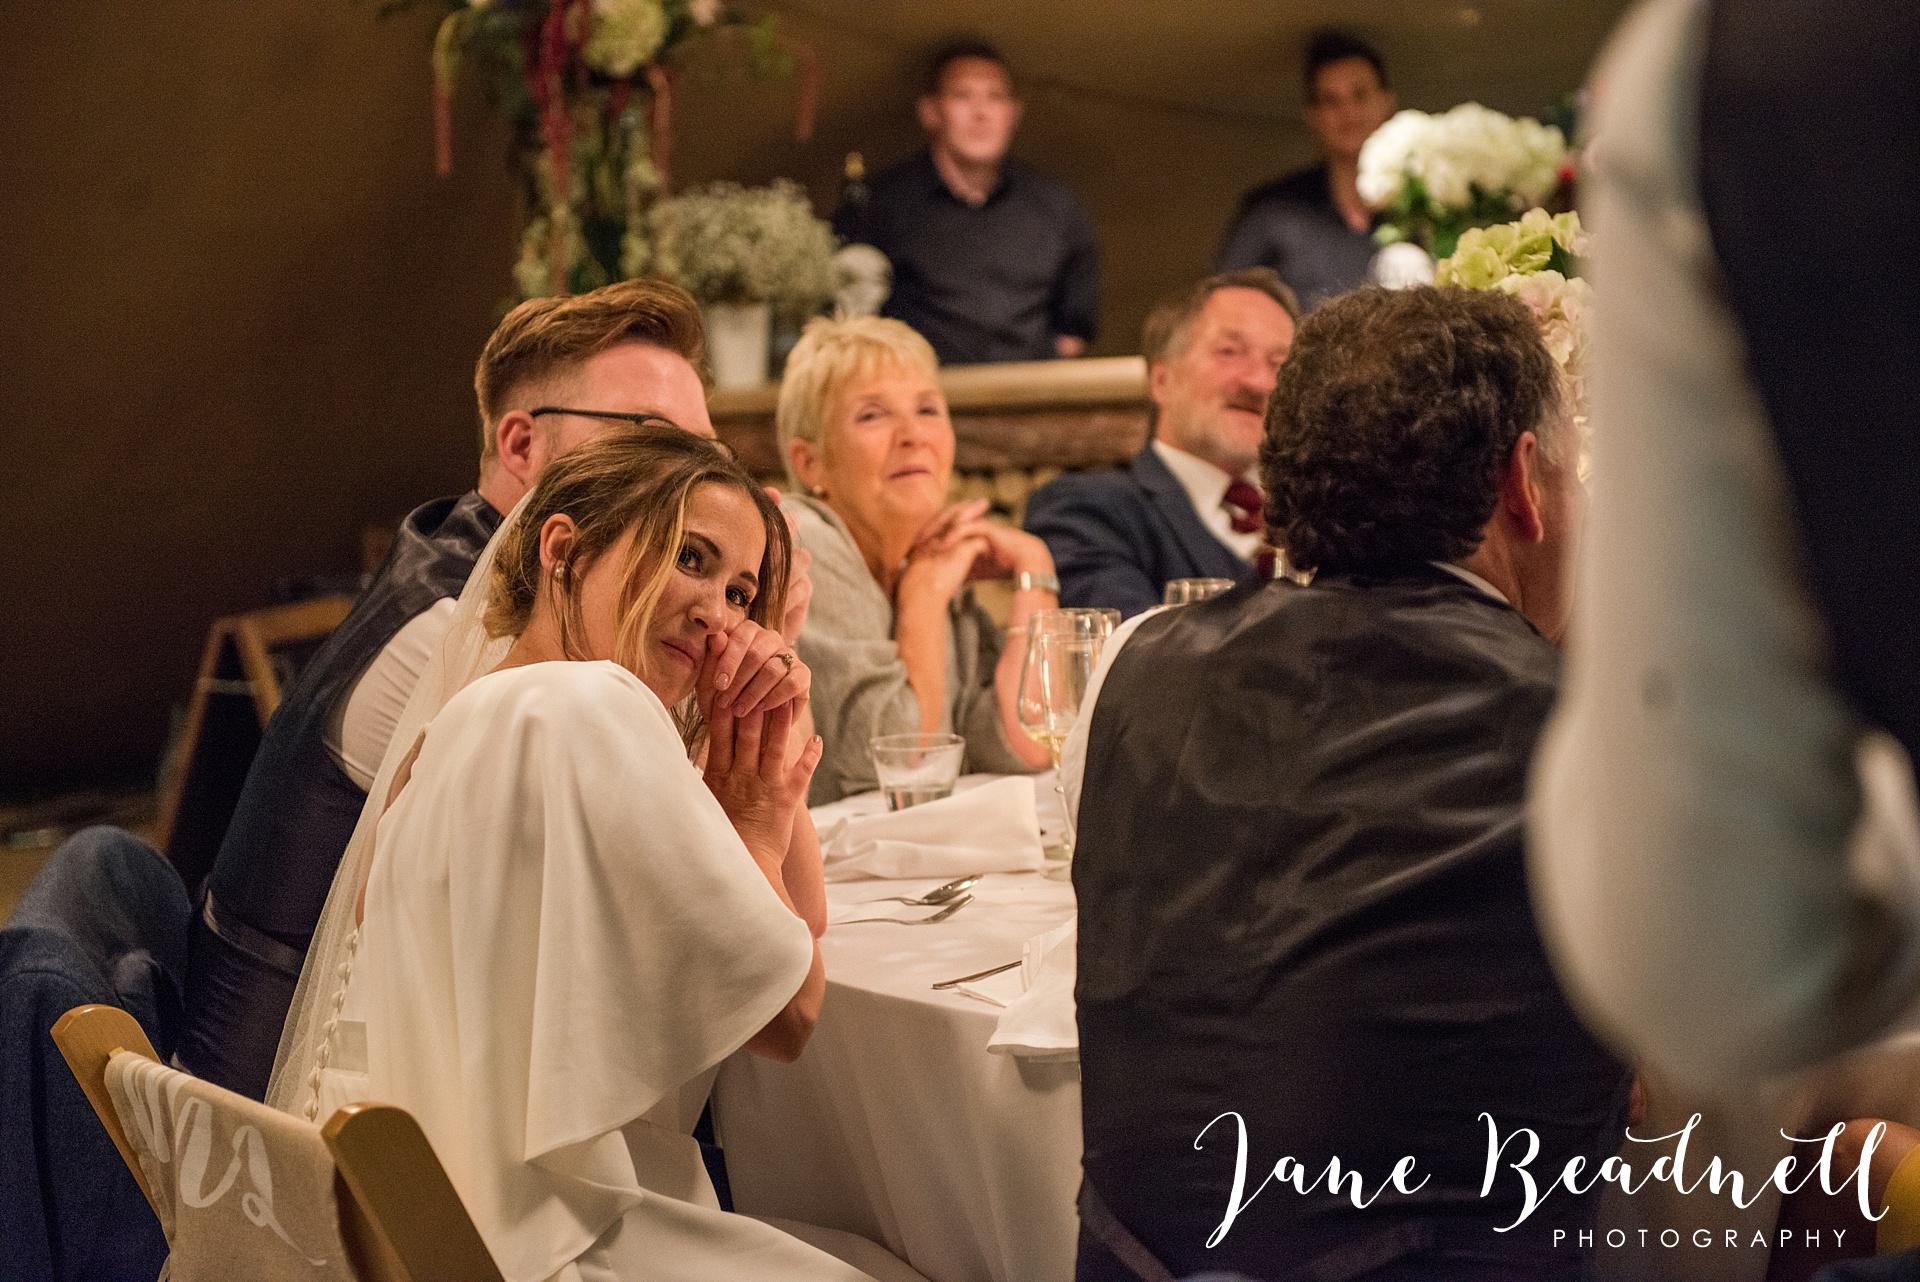 fine-art-wedding-photographer-jane-beadnell-yorkshire-wedding-photographer_0146